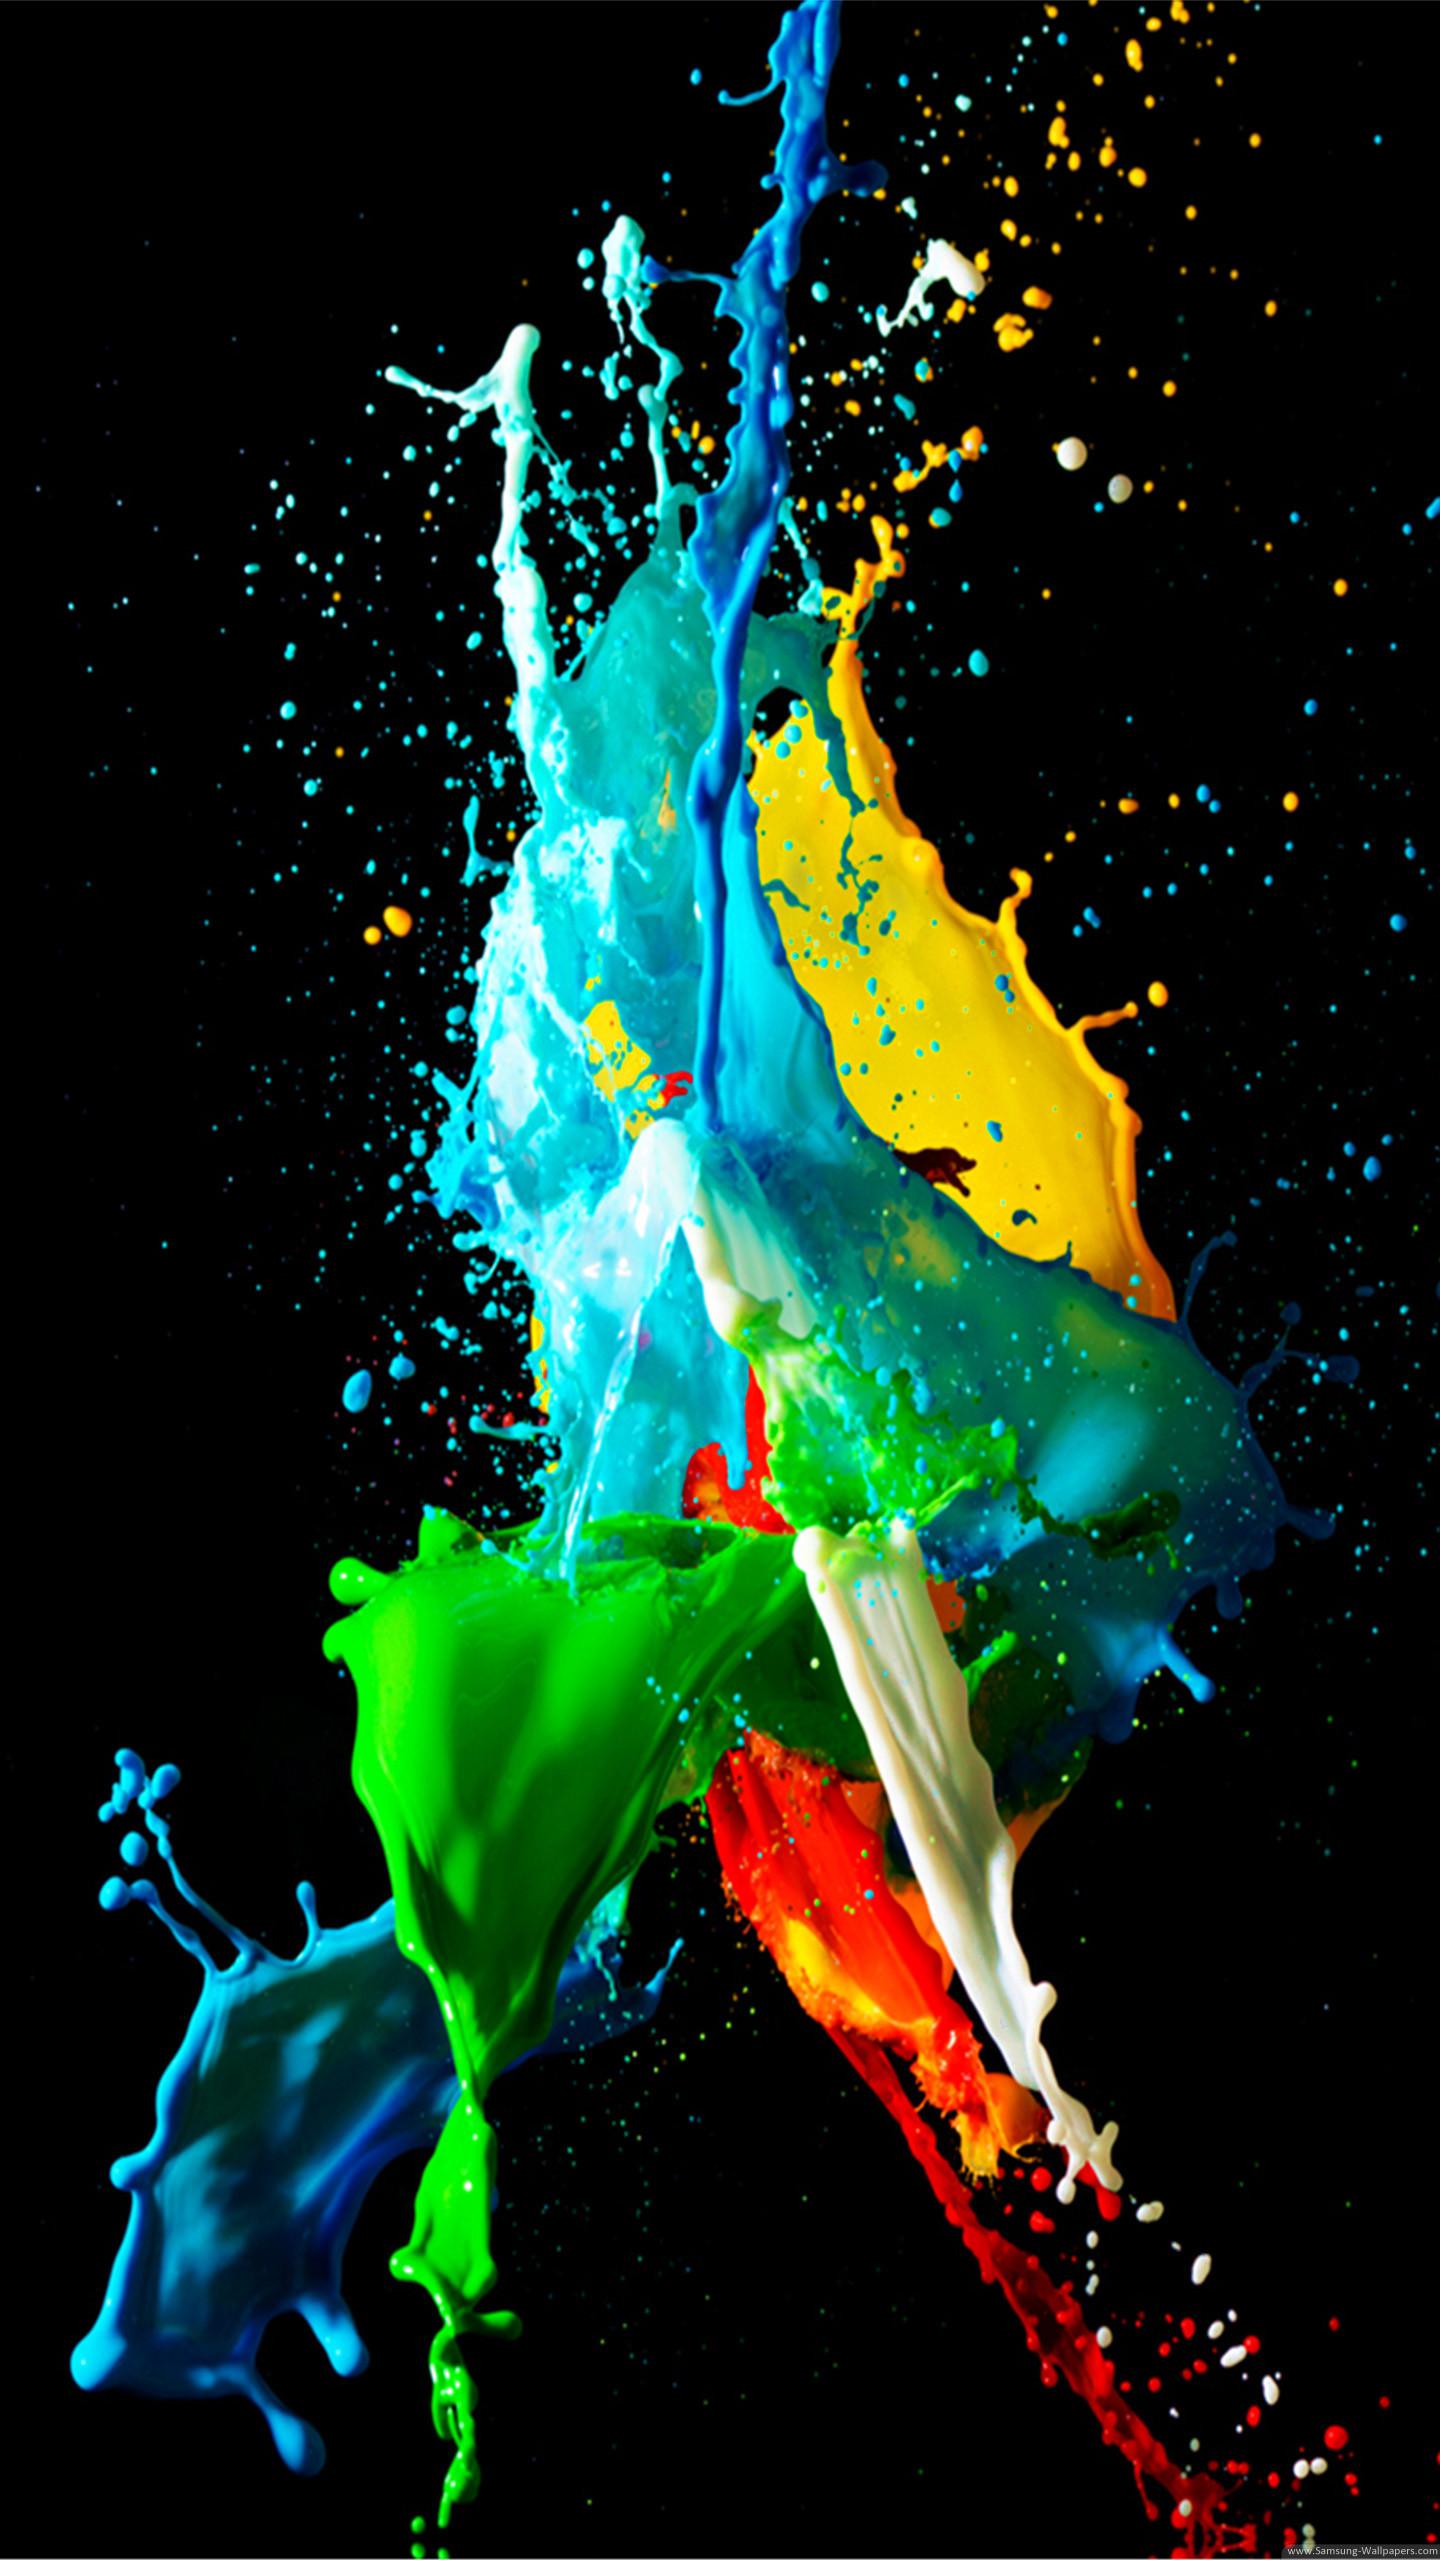 Coole Kurzhaarfrisuren Bilder